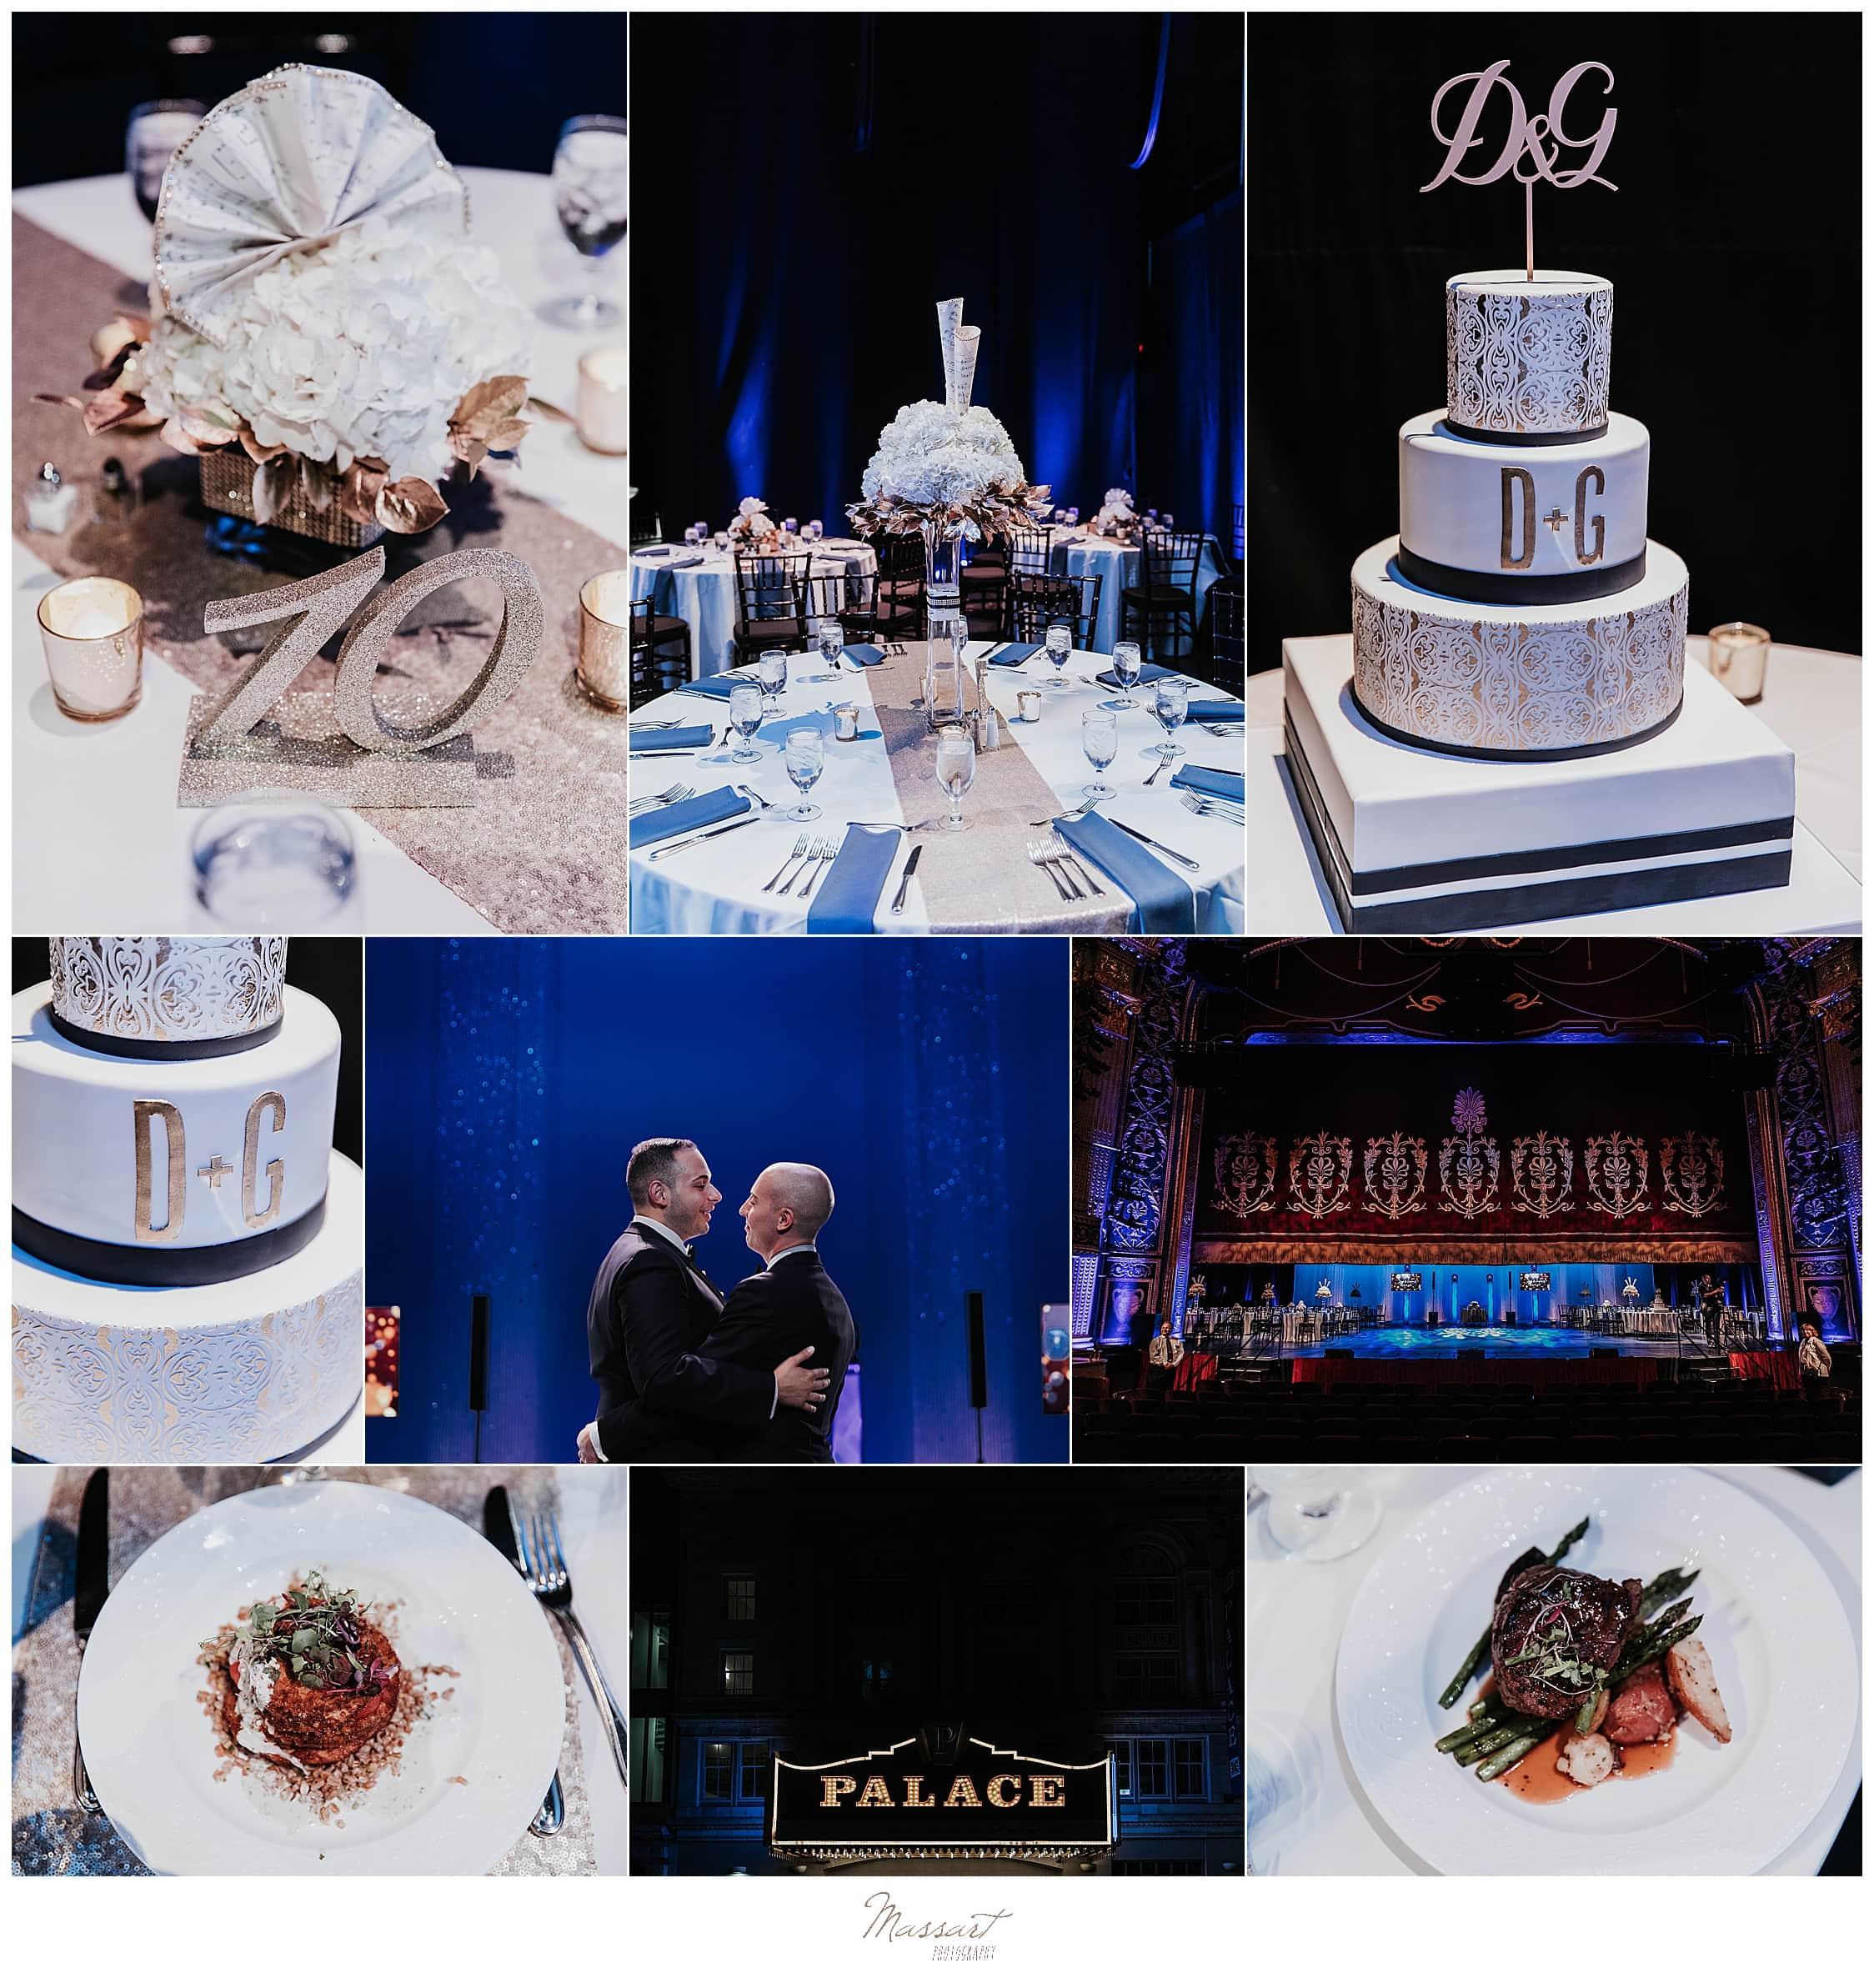 glamorous wedding reception details photographed by wedding photographers Massart Photography